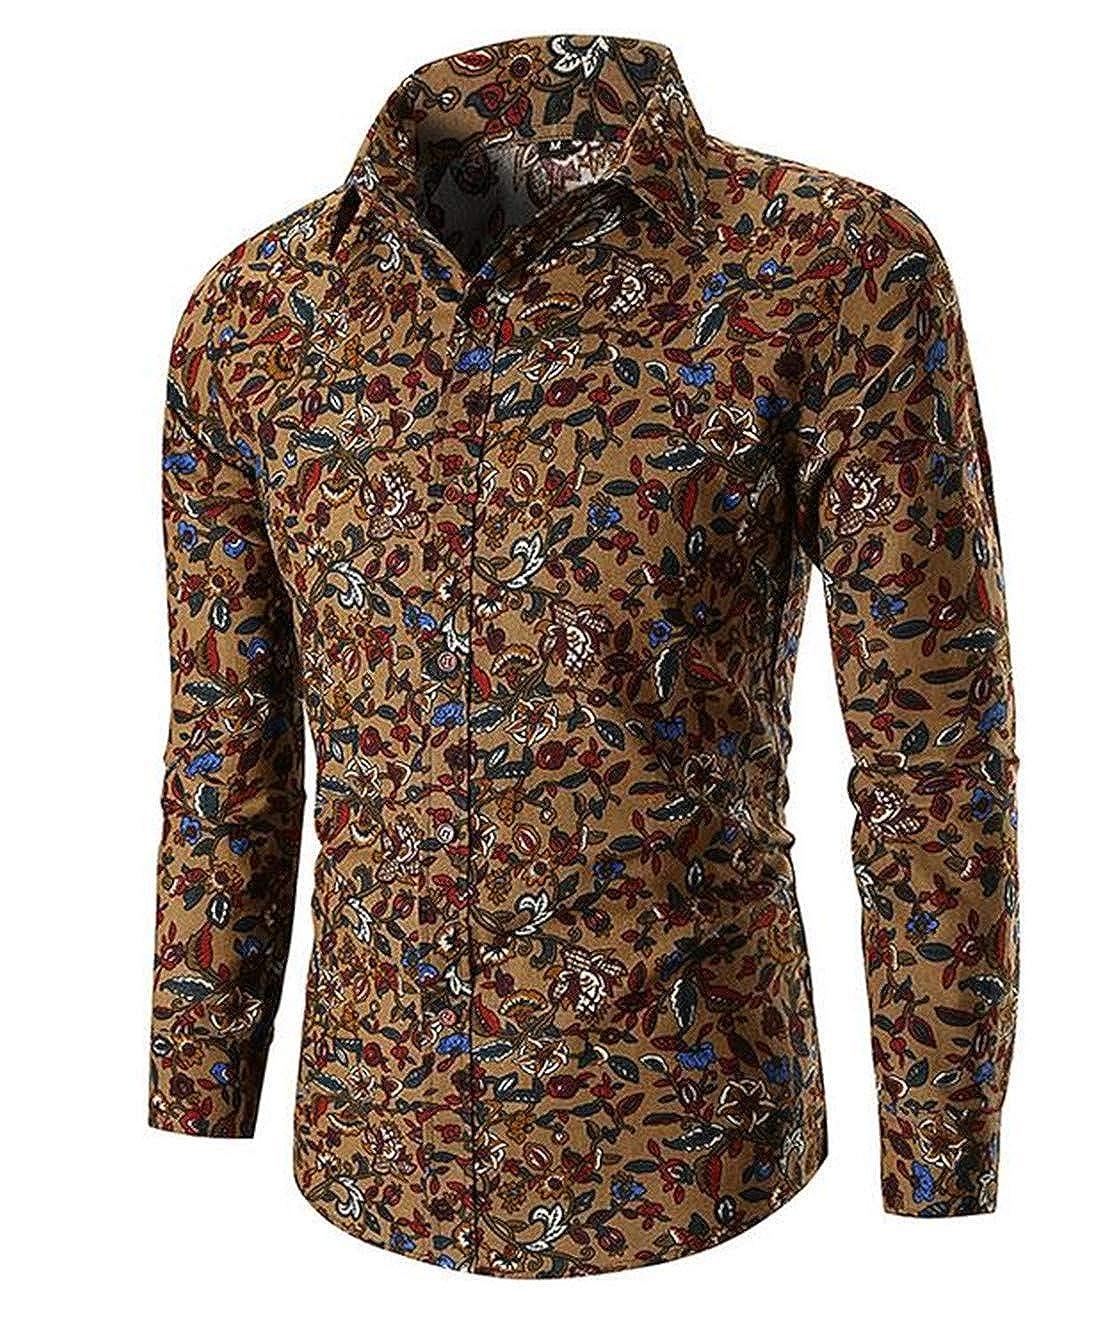 Nanquan Men Slim Fit Lapel Button Down Long Sleeve Floral Print Dress Shirts